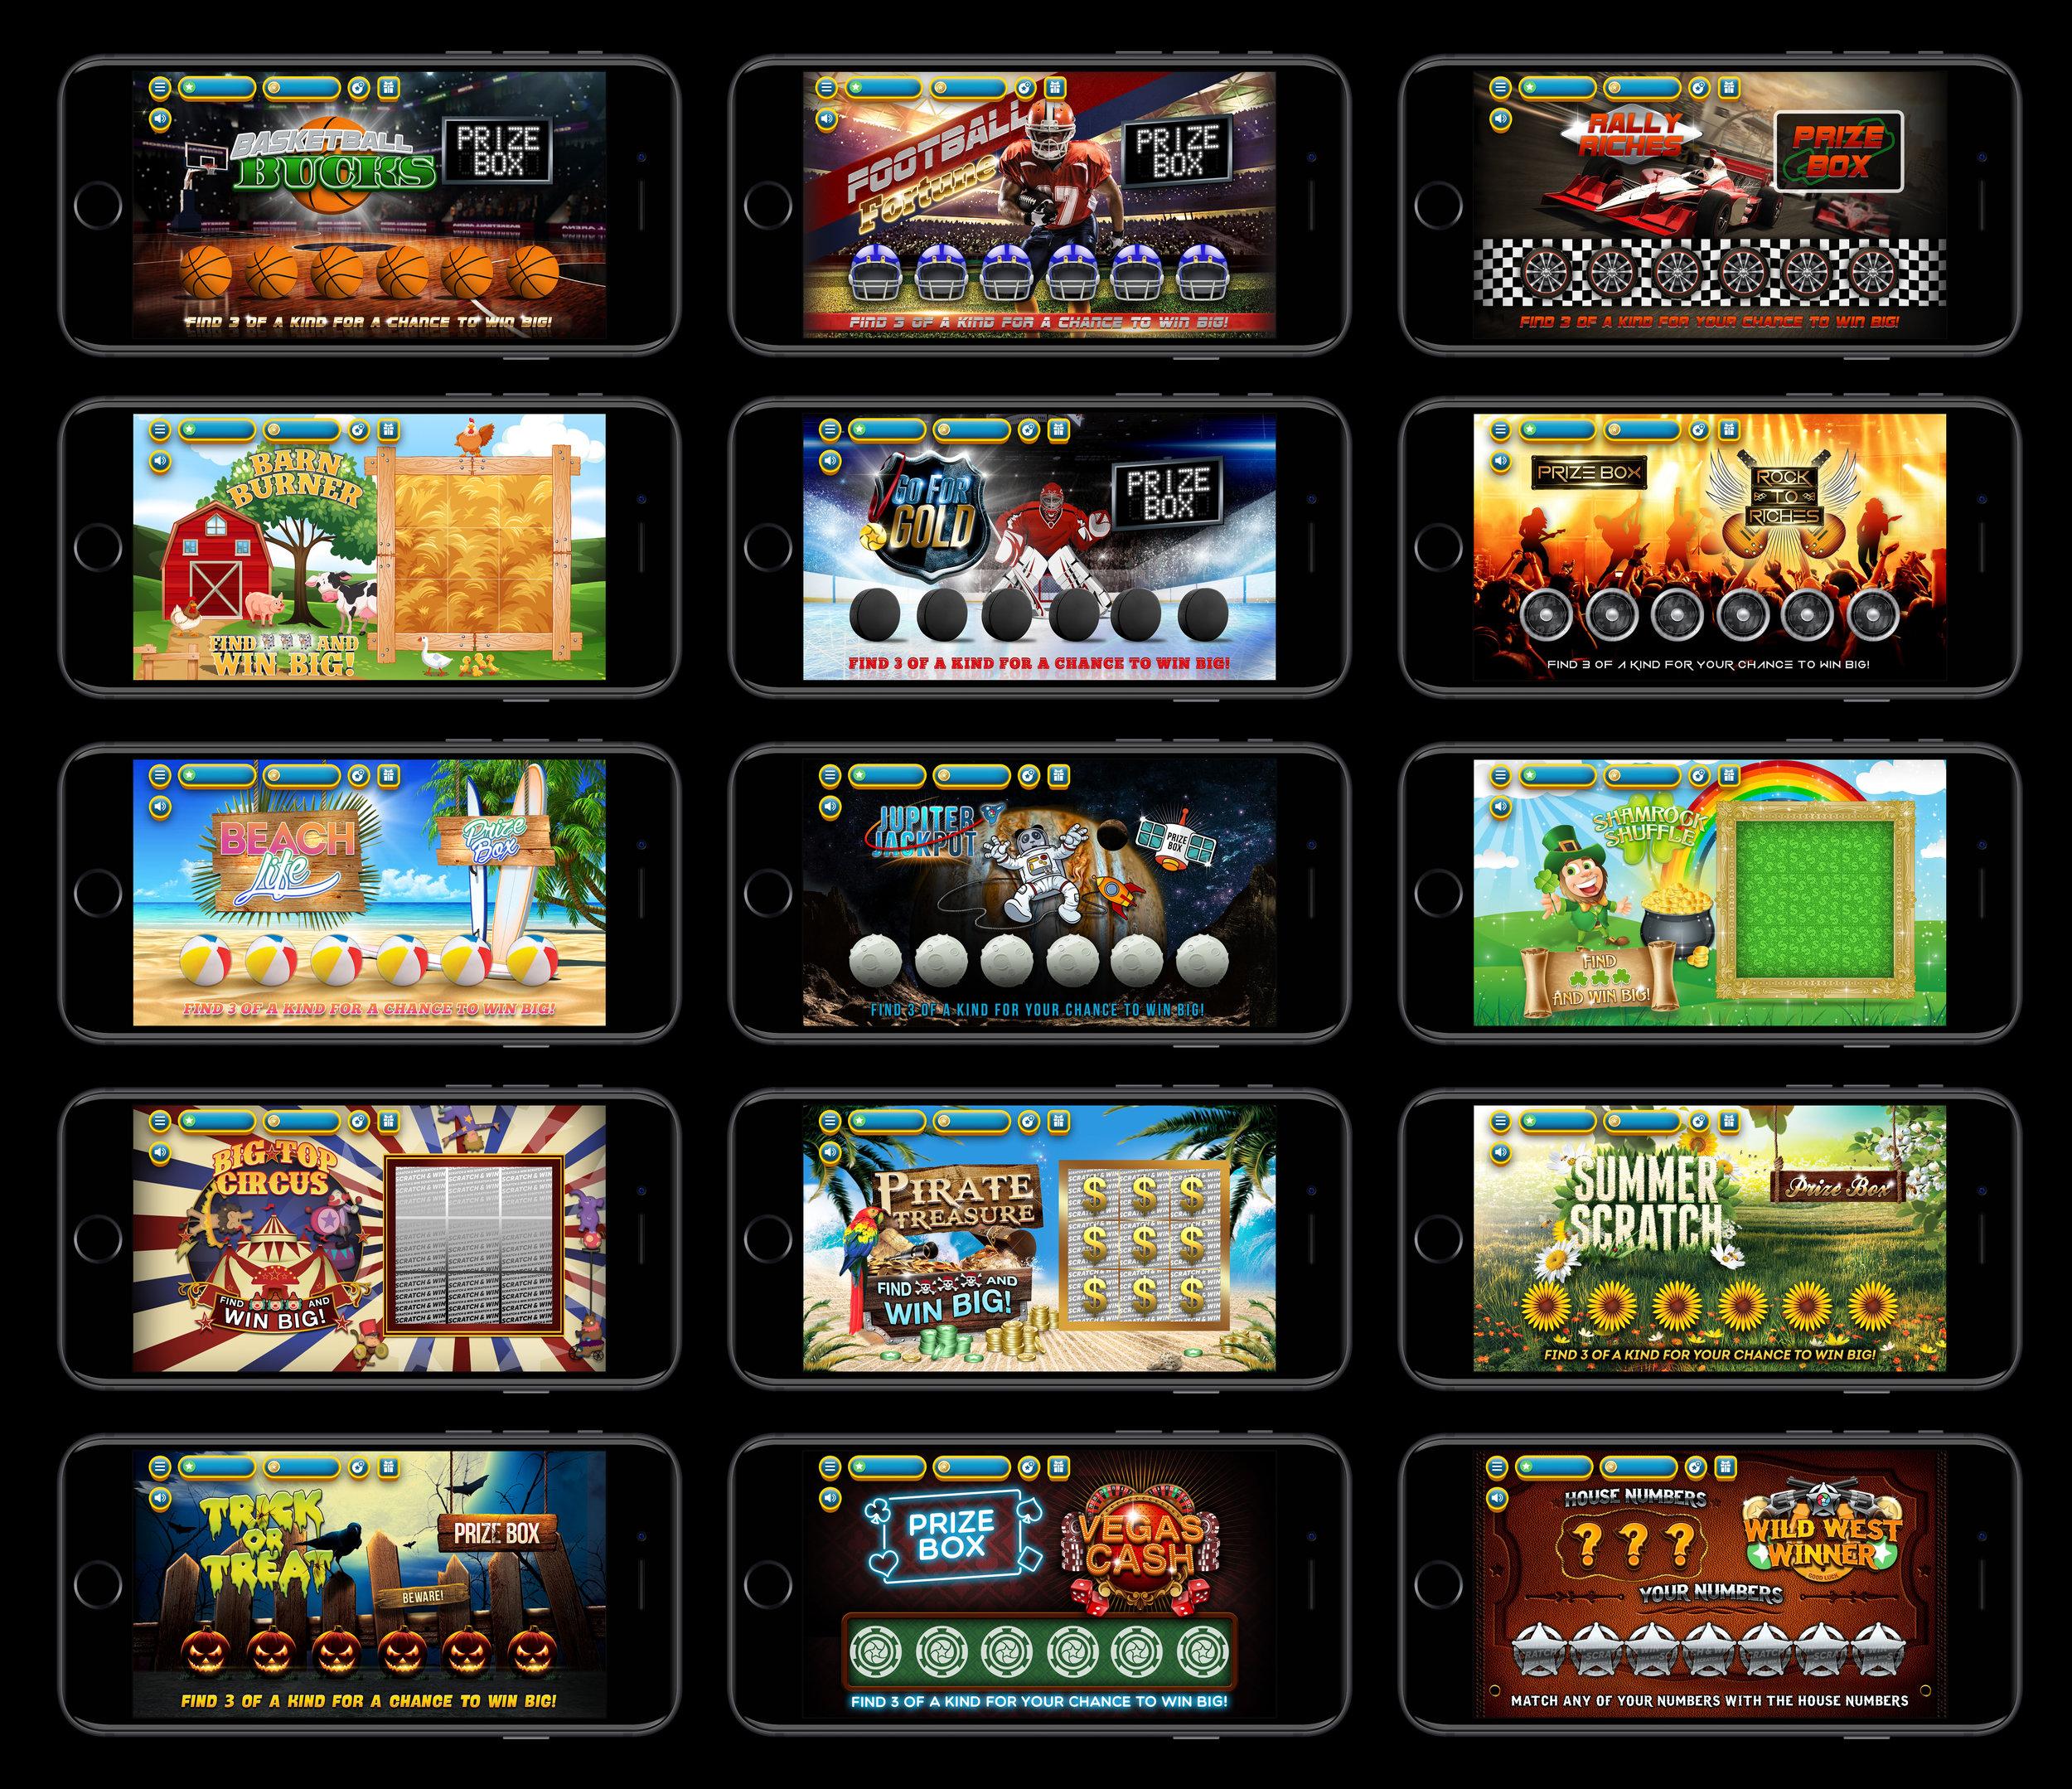 game_screens.jpg